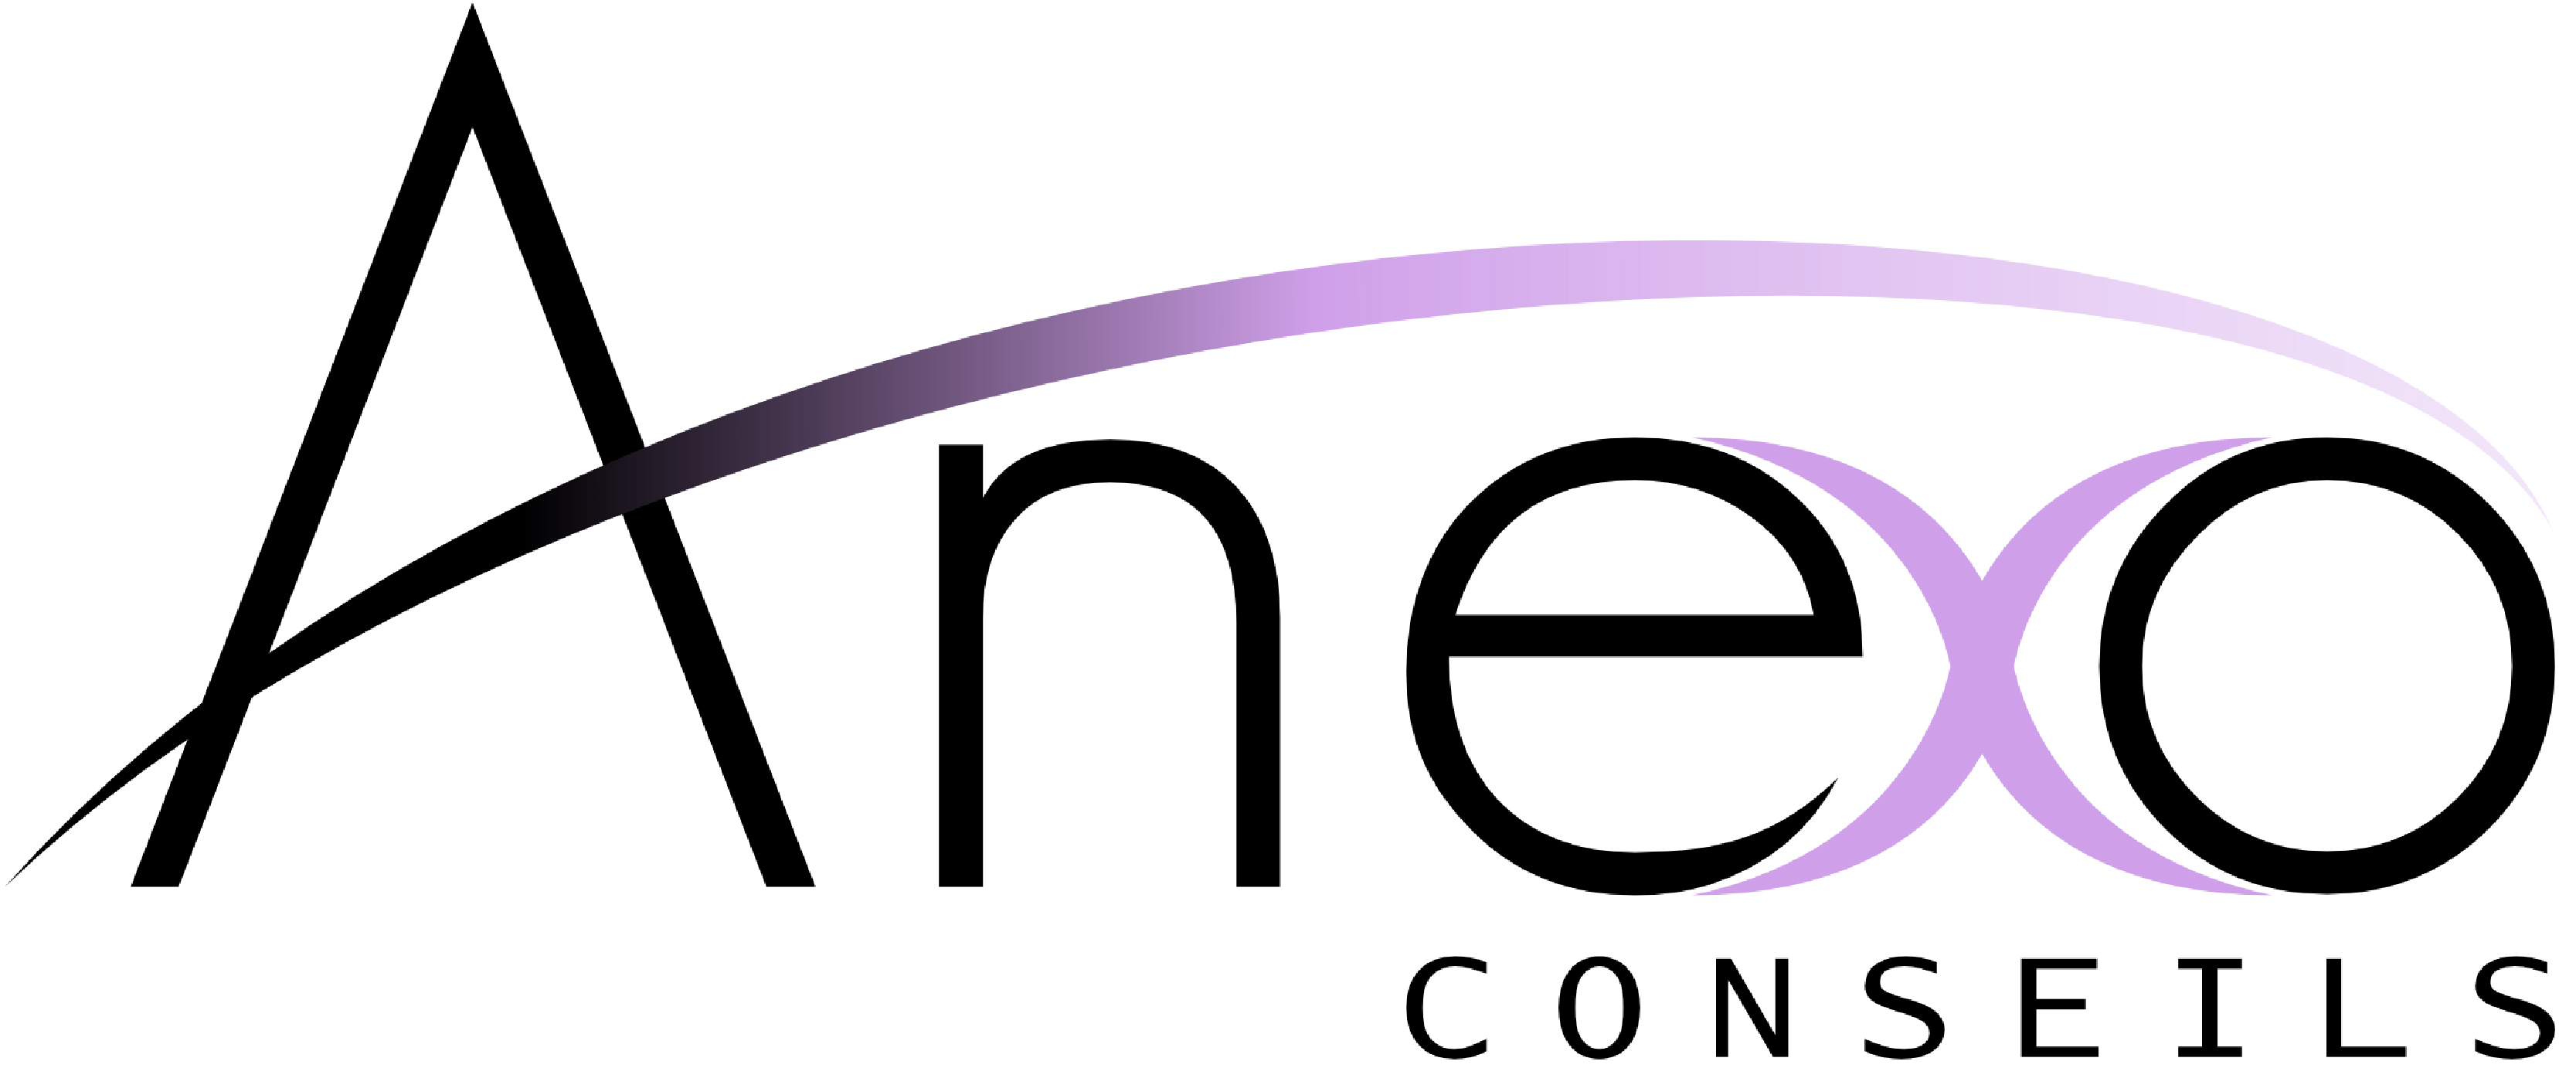 Anexo Conseils